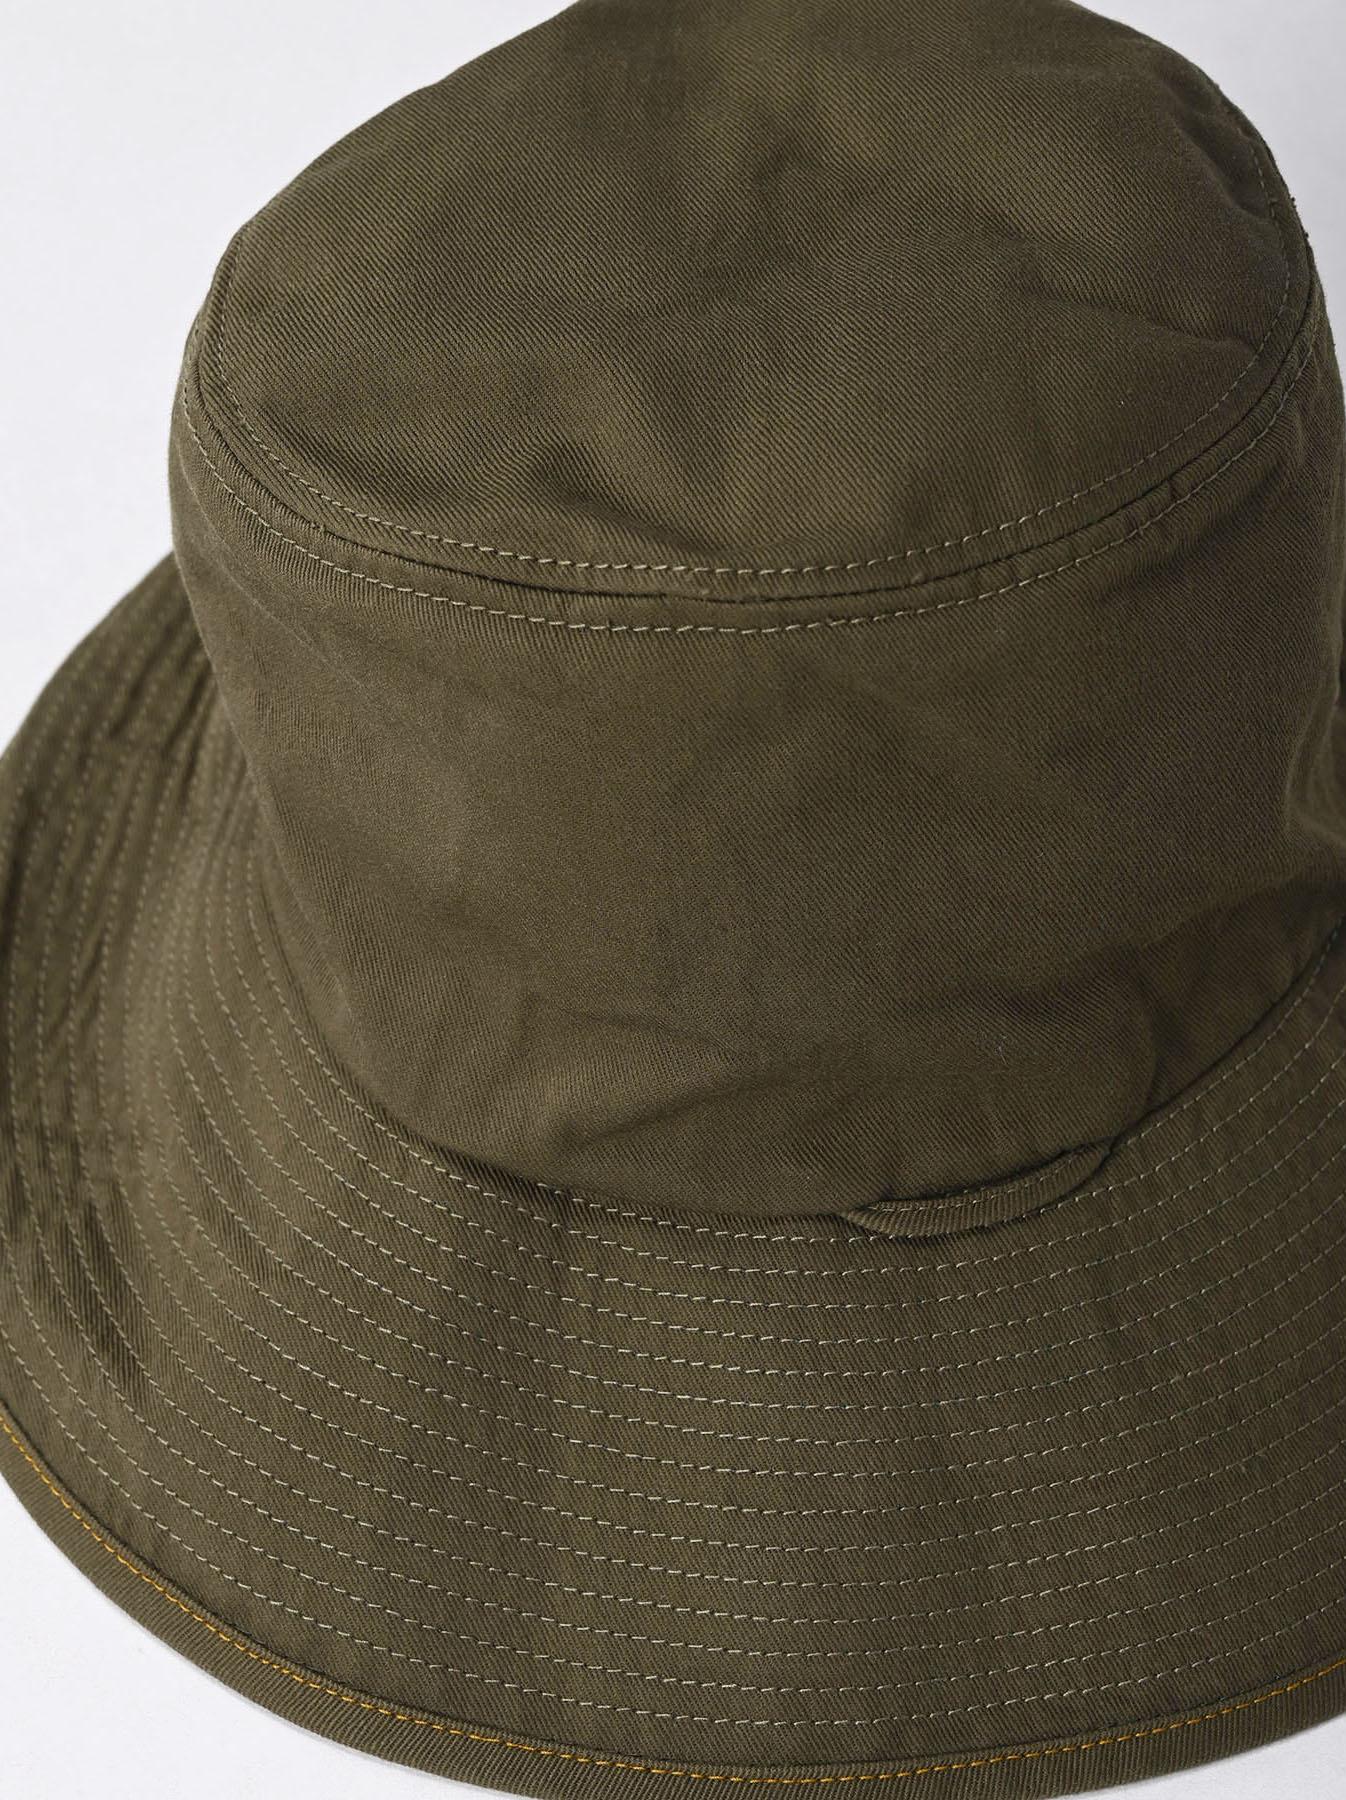 Okome Chino Sail Hat (0521)-6